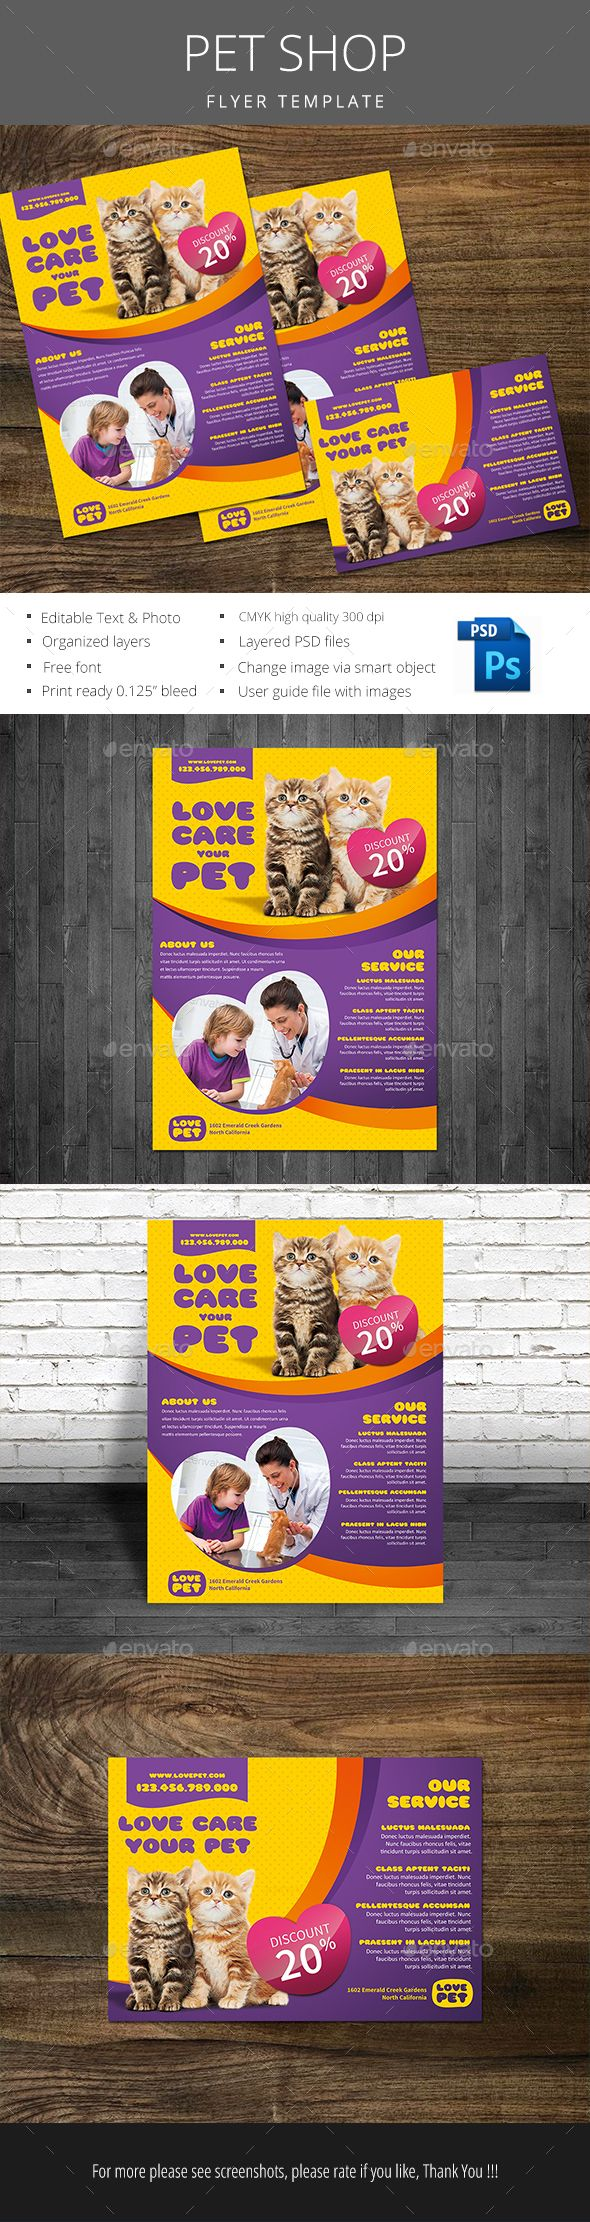 Pet Shop Flyer Template PSD. Download here: http://graphicriver.net/item/pet-shop-flyer/15111717?ref=ksioks